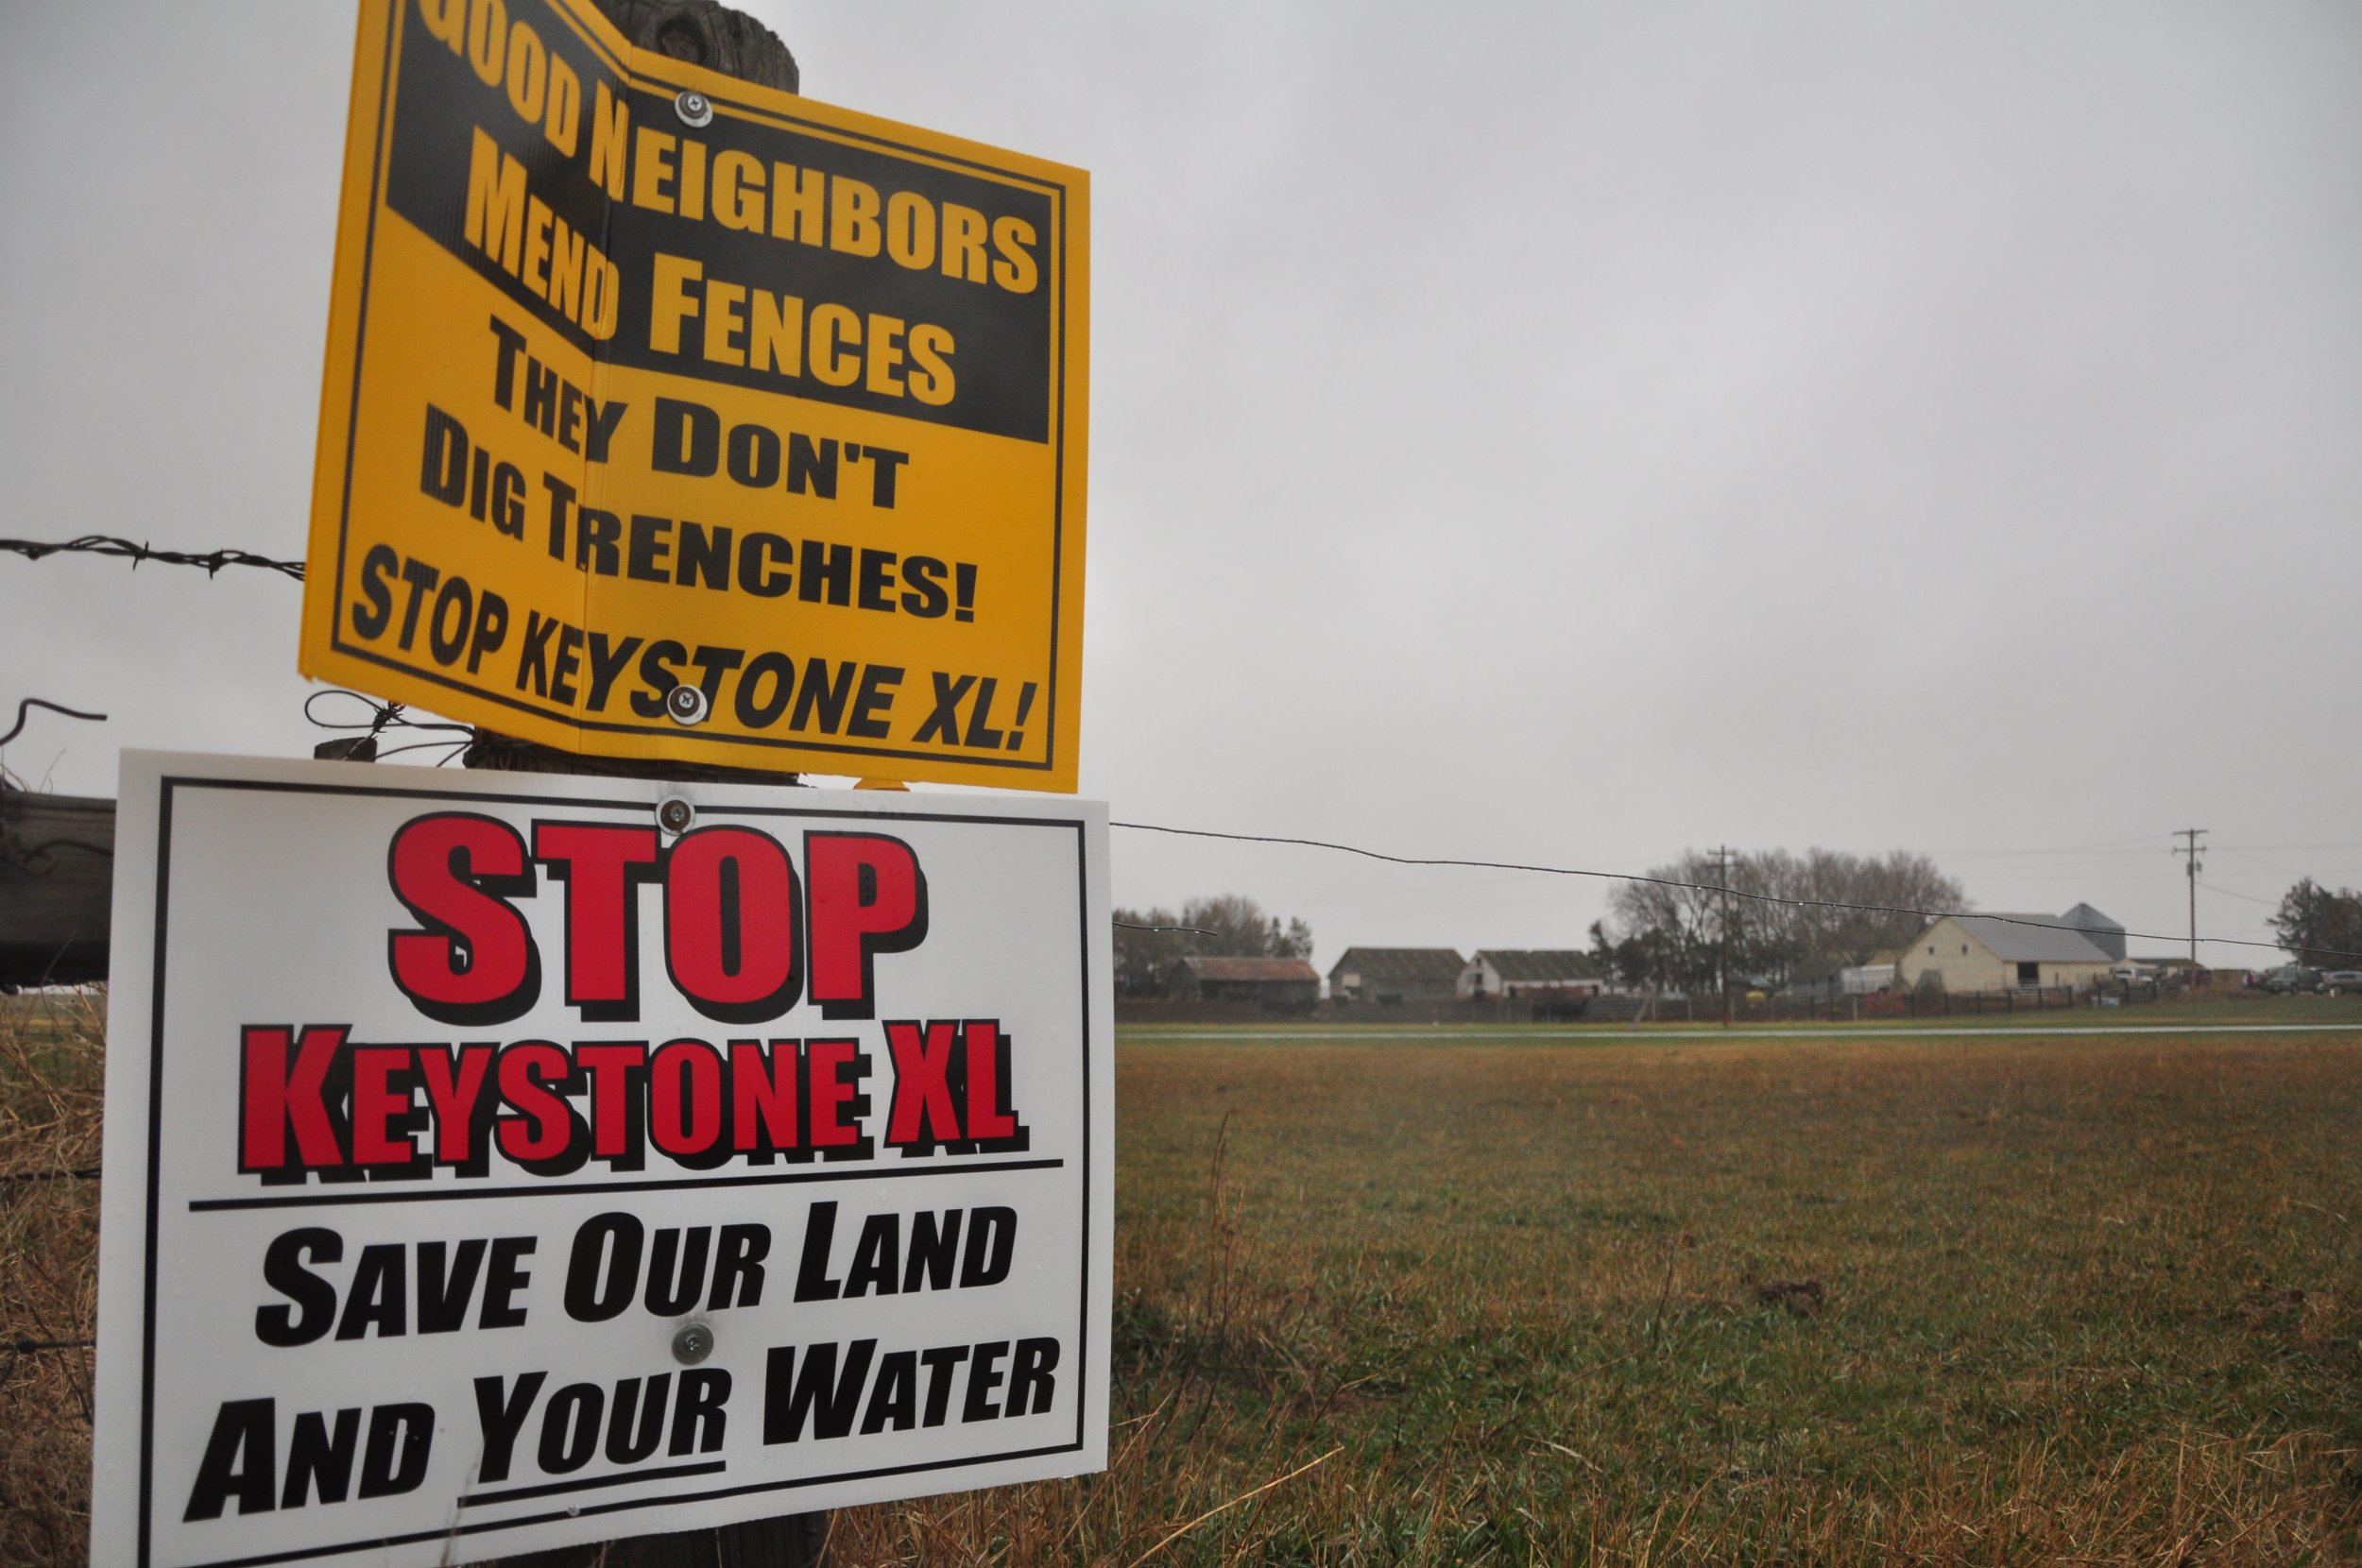 Landowners Win Temporary Eminent Domain Injunction Over Keystone